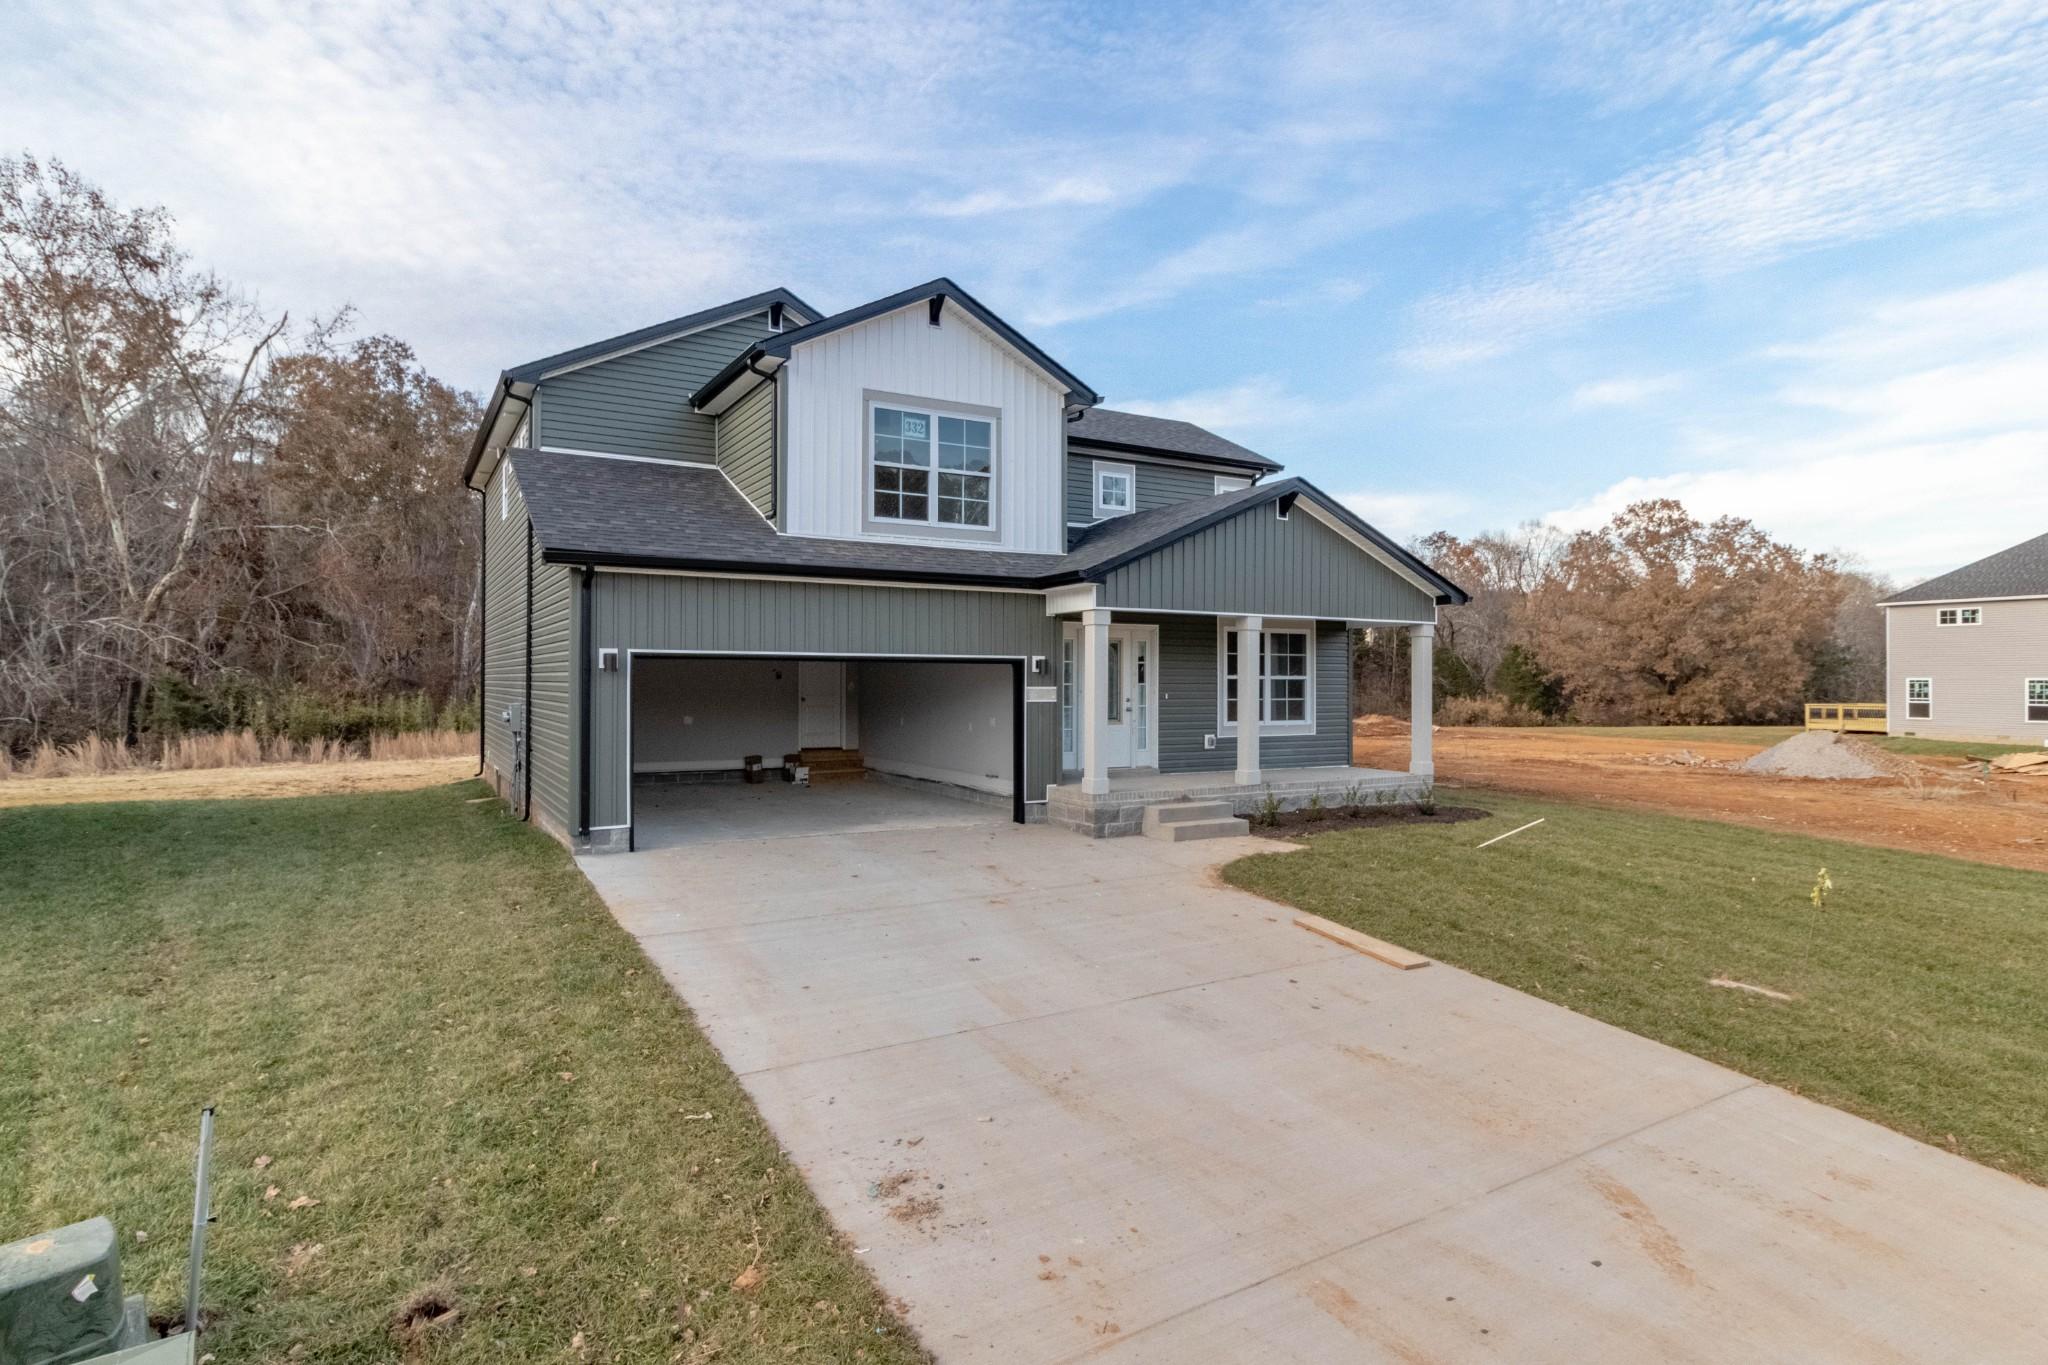 1689 Rains Rd, Clarksville, TN 37042 - Clarksville, TN real estate listing